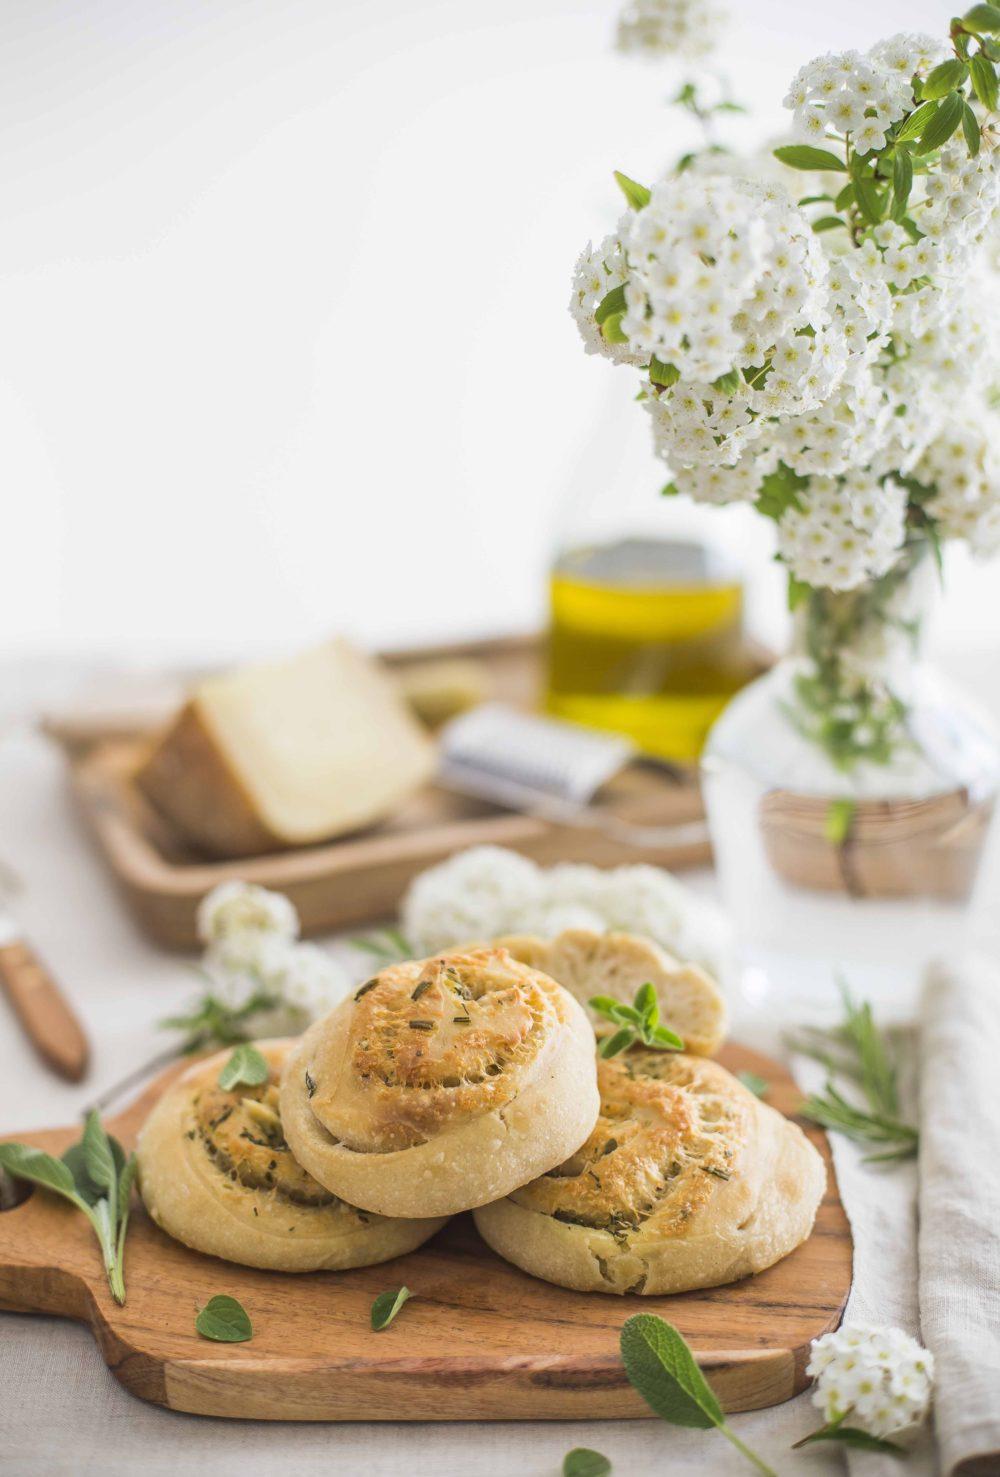 Girelle di pane alle erbe